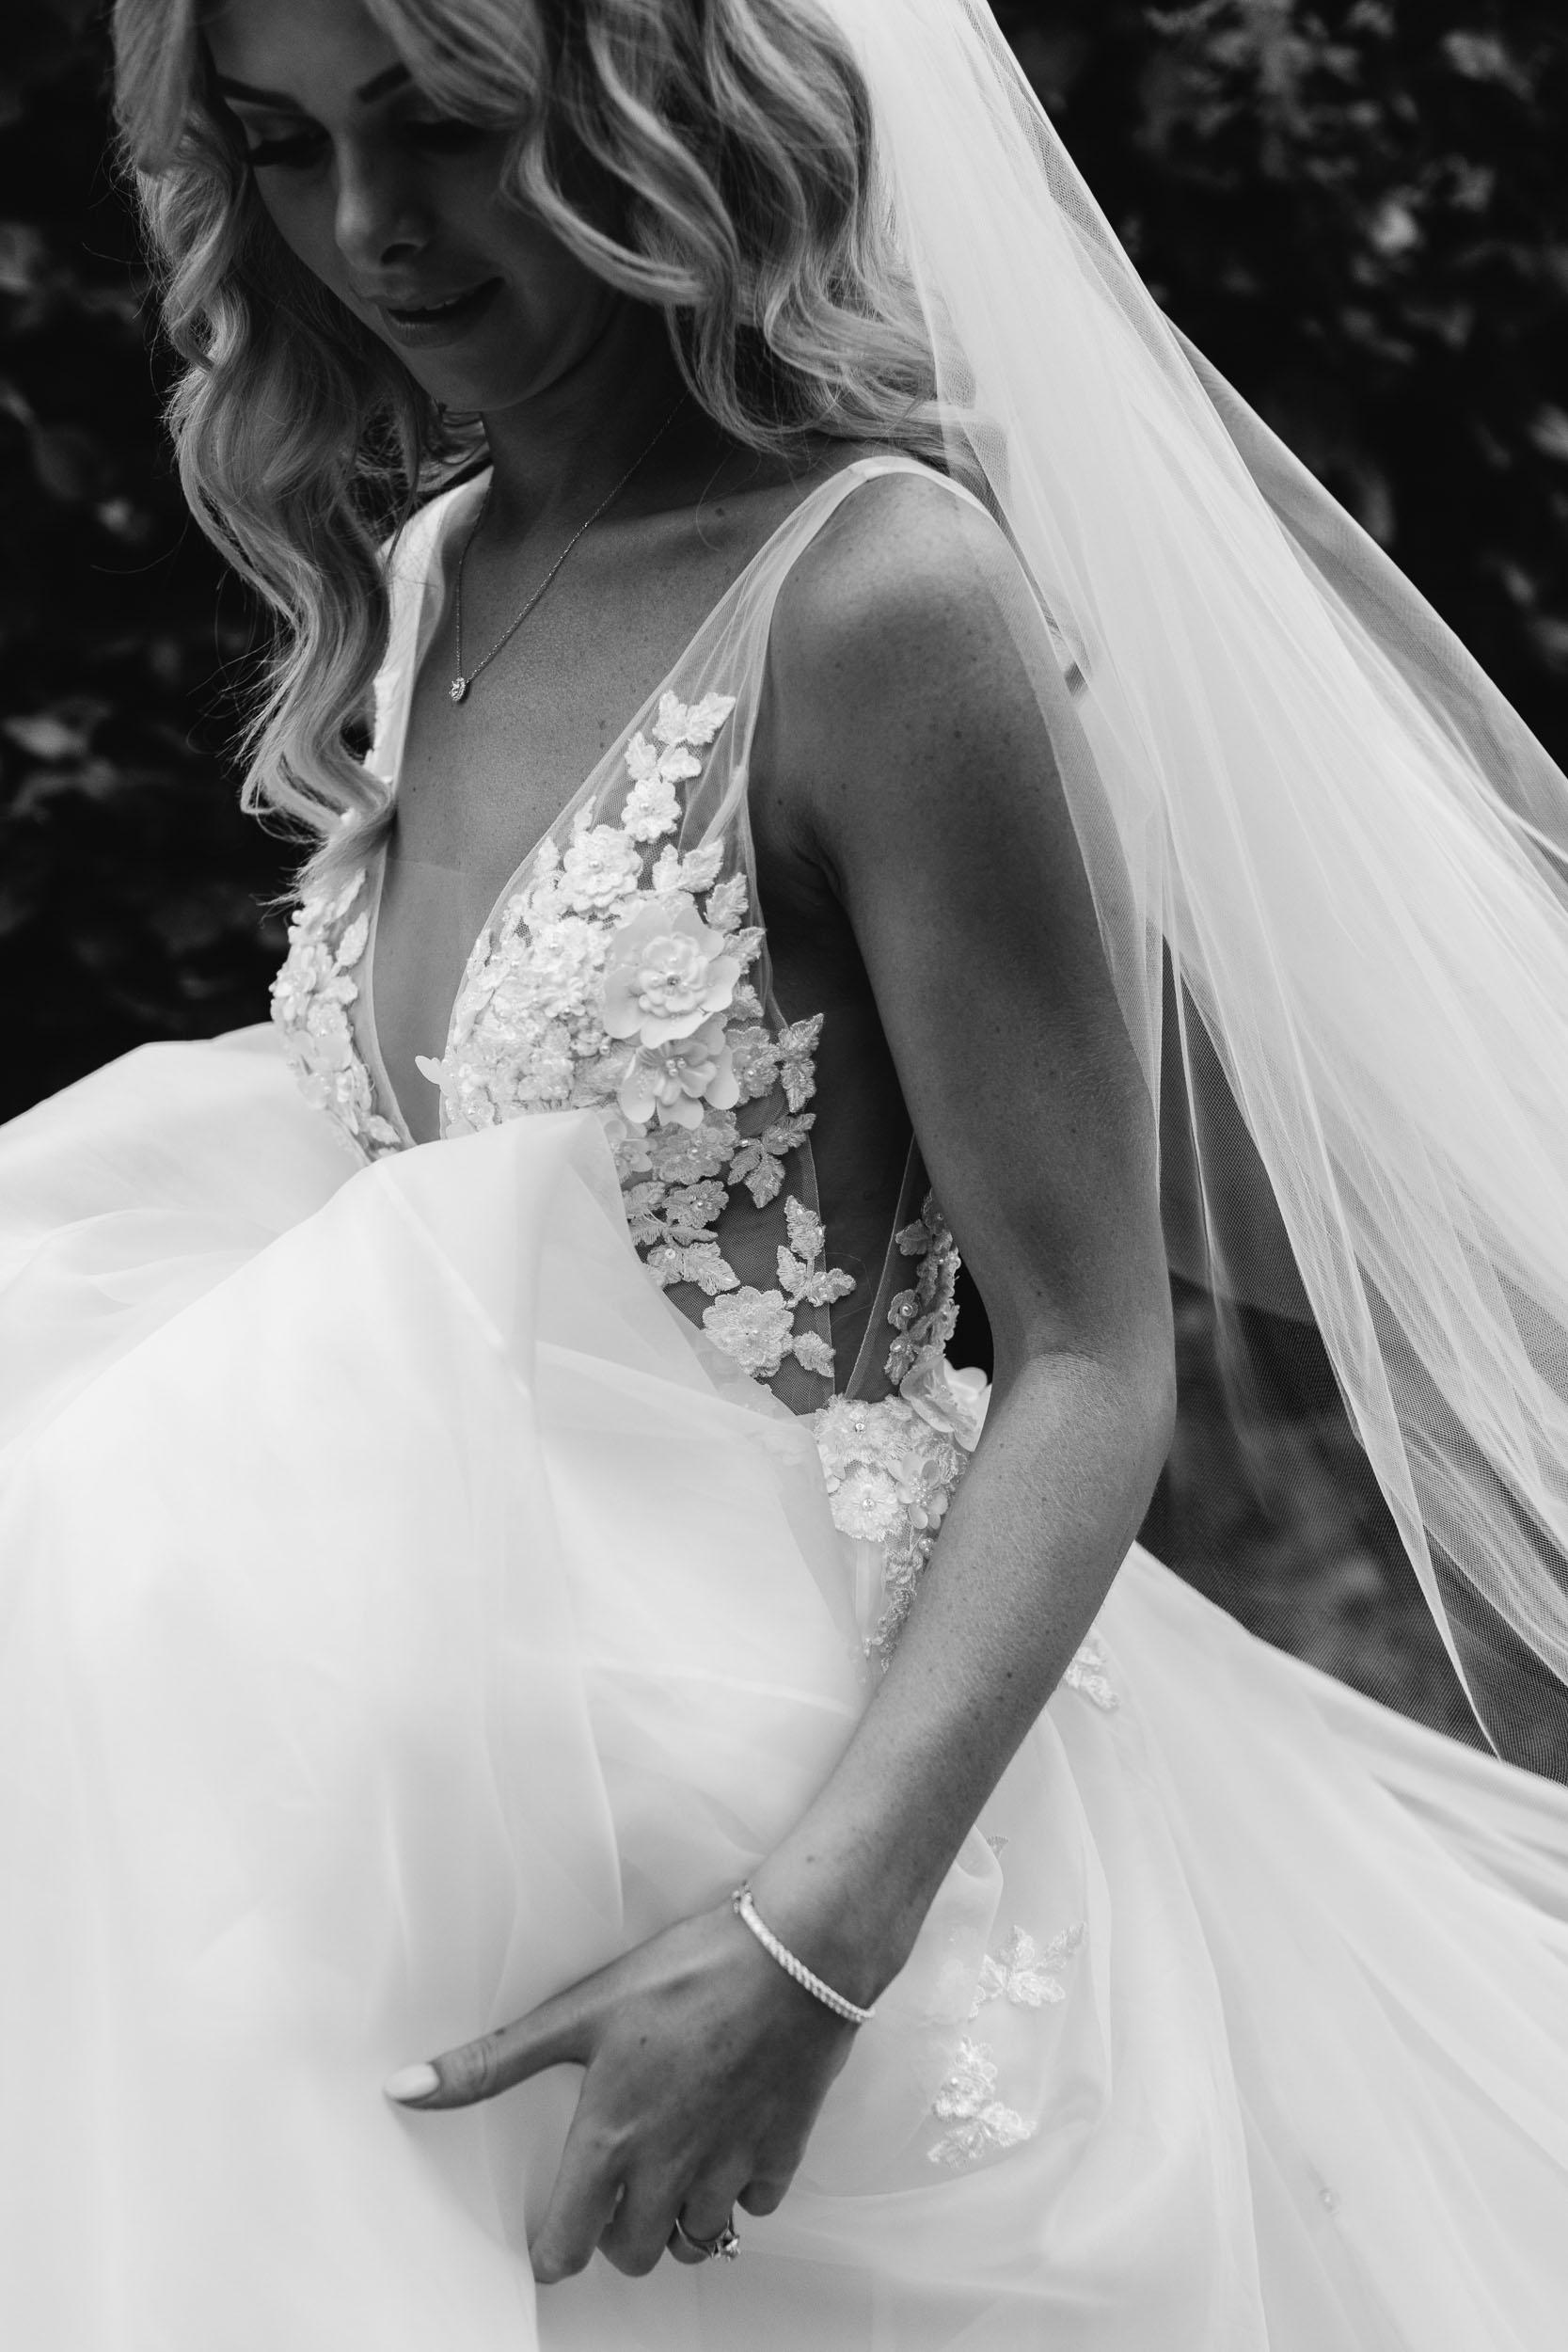 Kas-Richards-Mornington-Peninsula-Private-Property-Wedding-Marianna-Hardwick-Gown-131.jpg